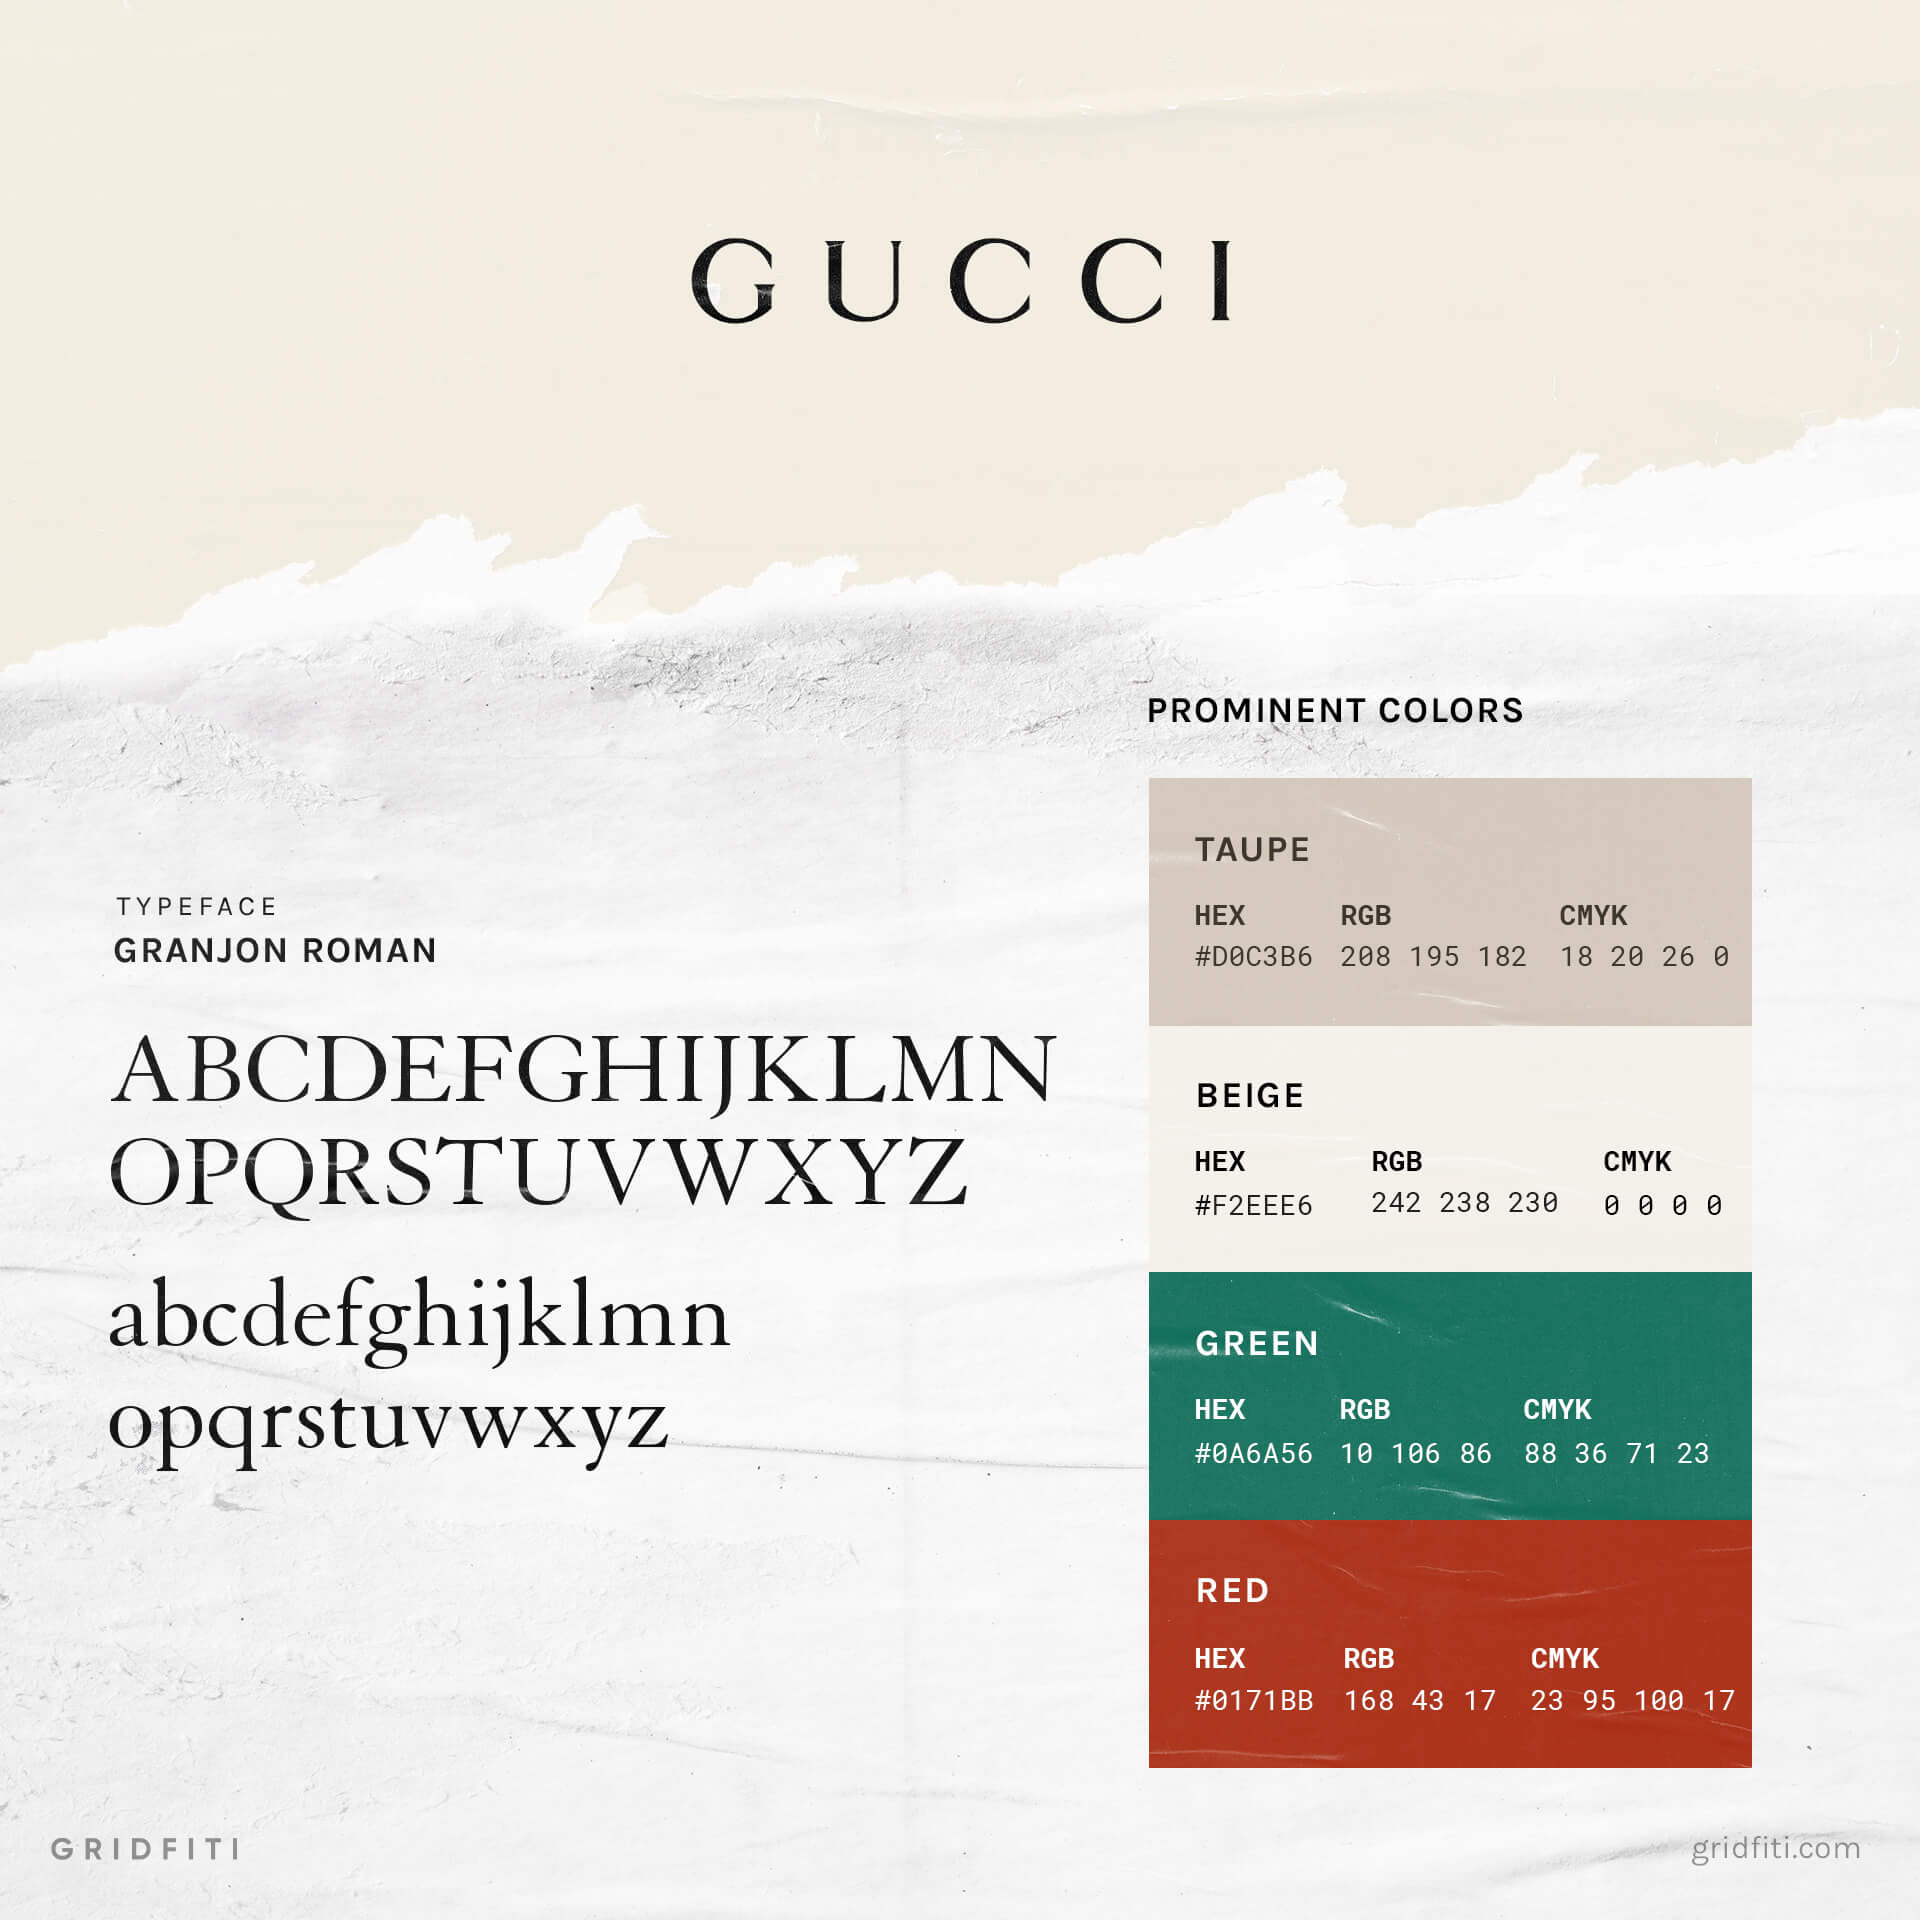 Gucci Colors & Font Style